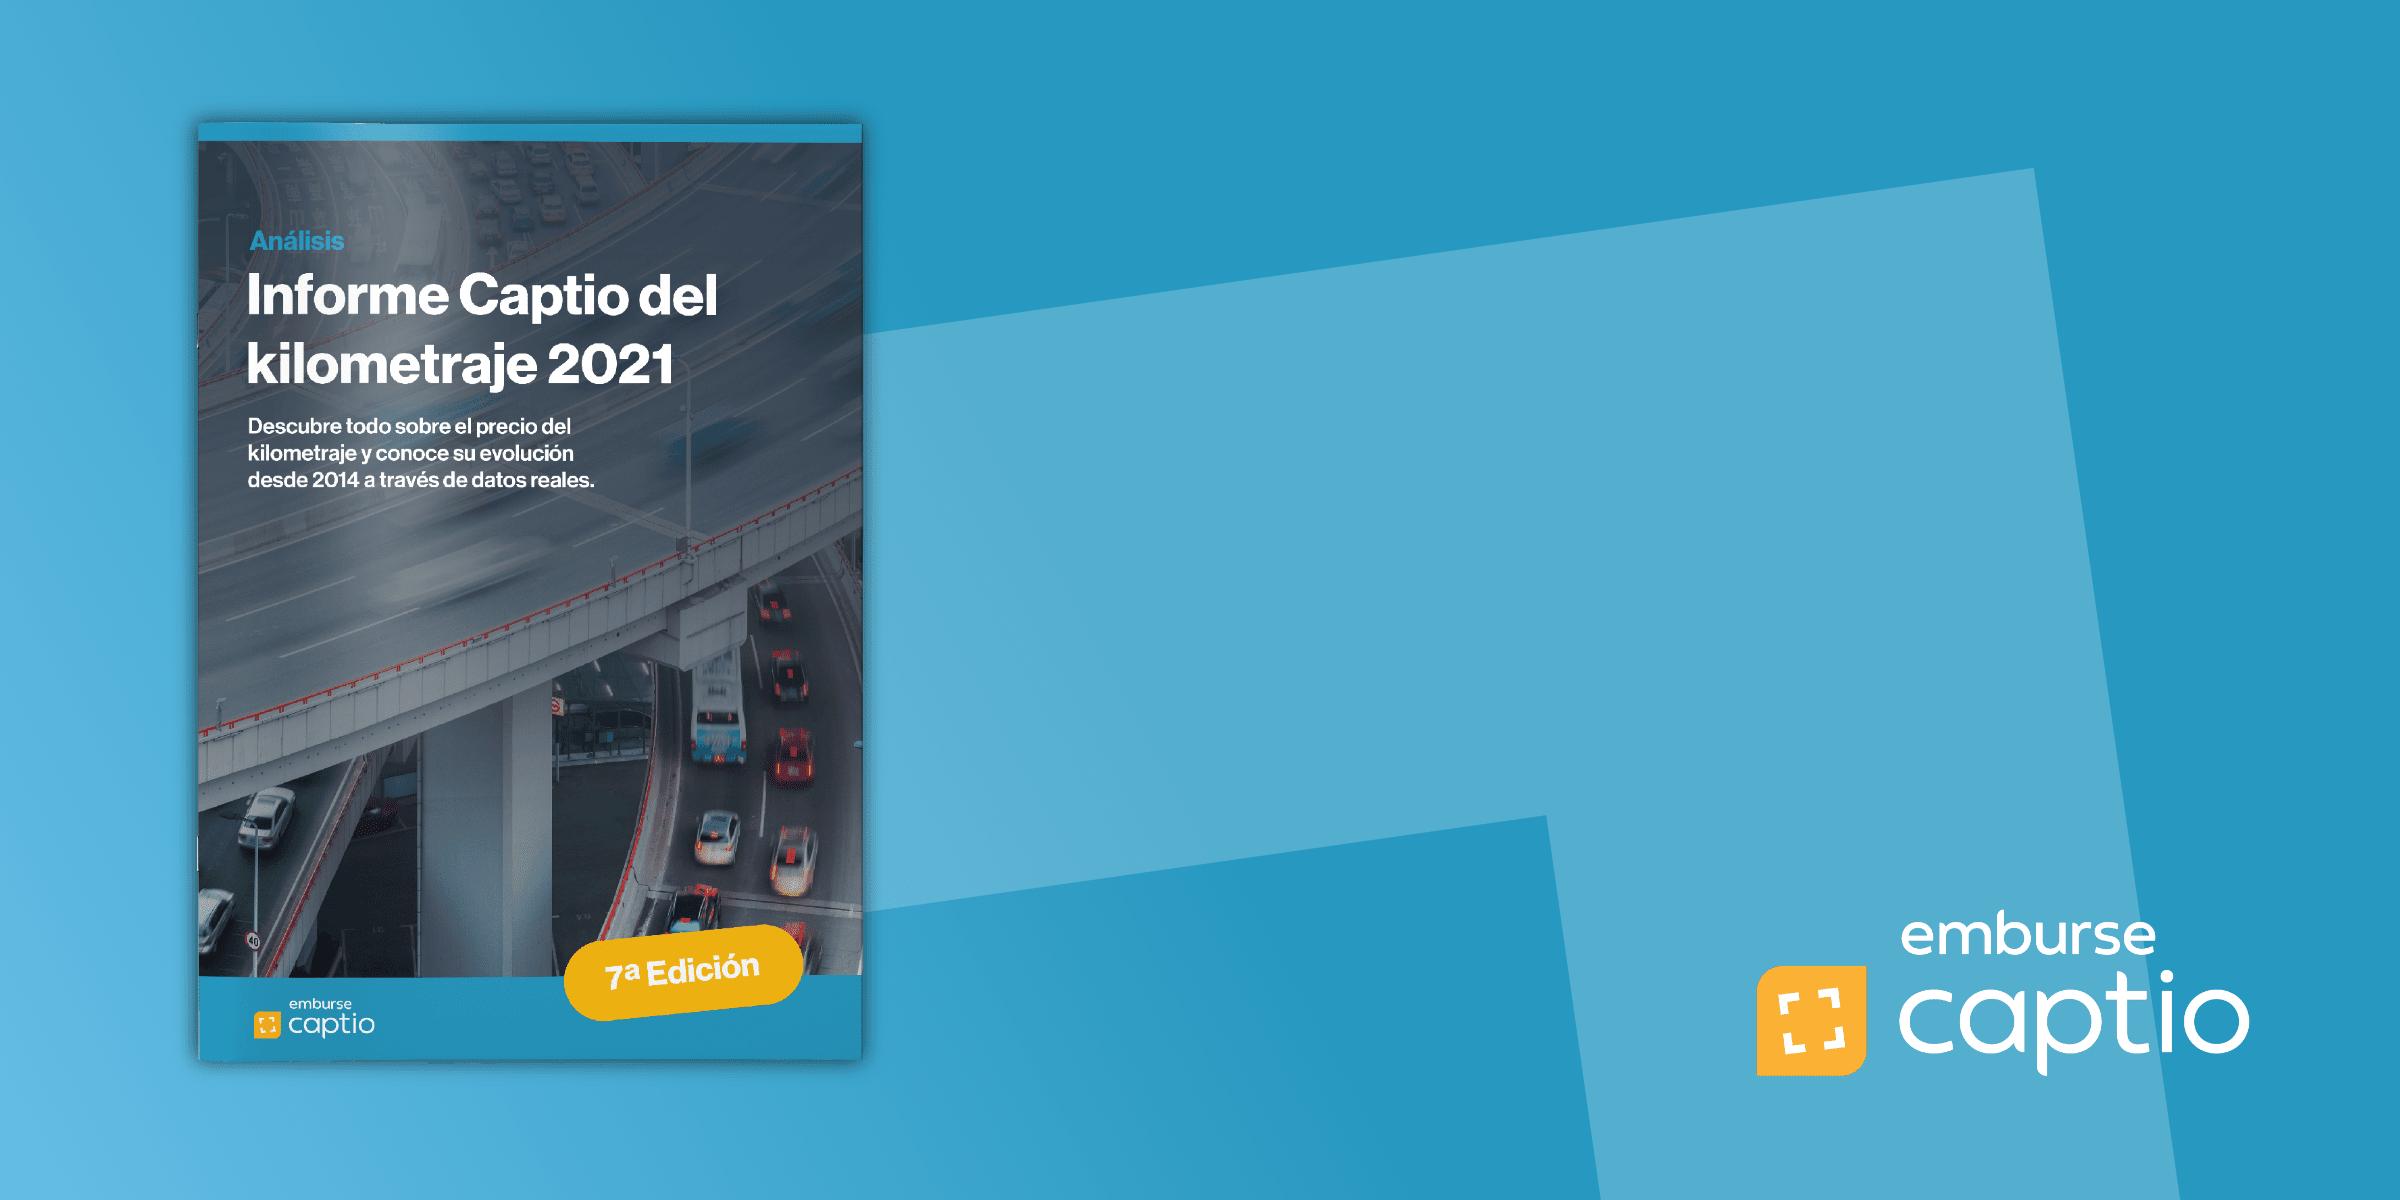 Análisis: Informe Captio del kilometraje 2021